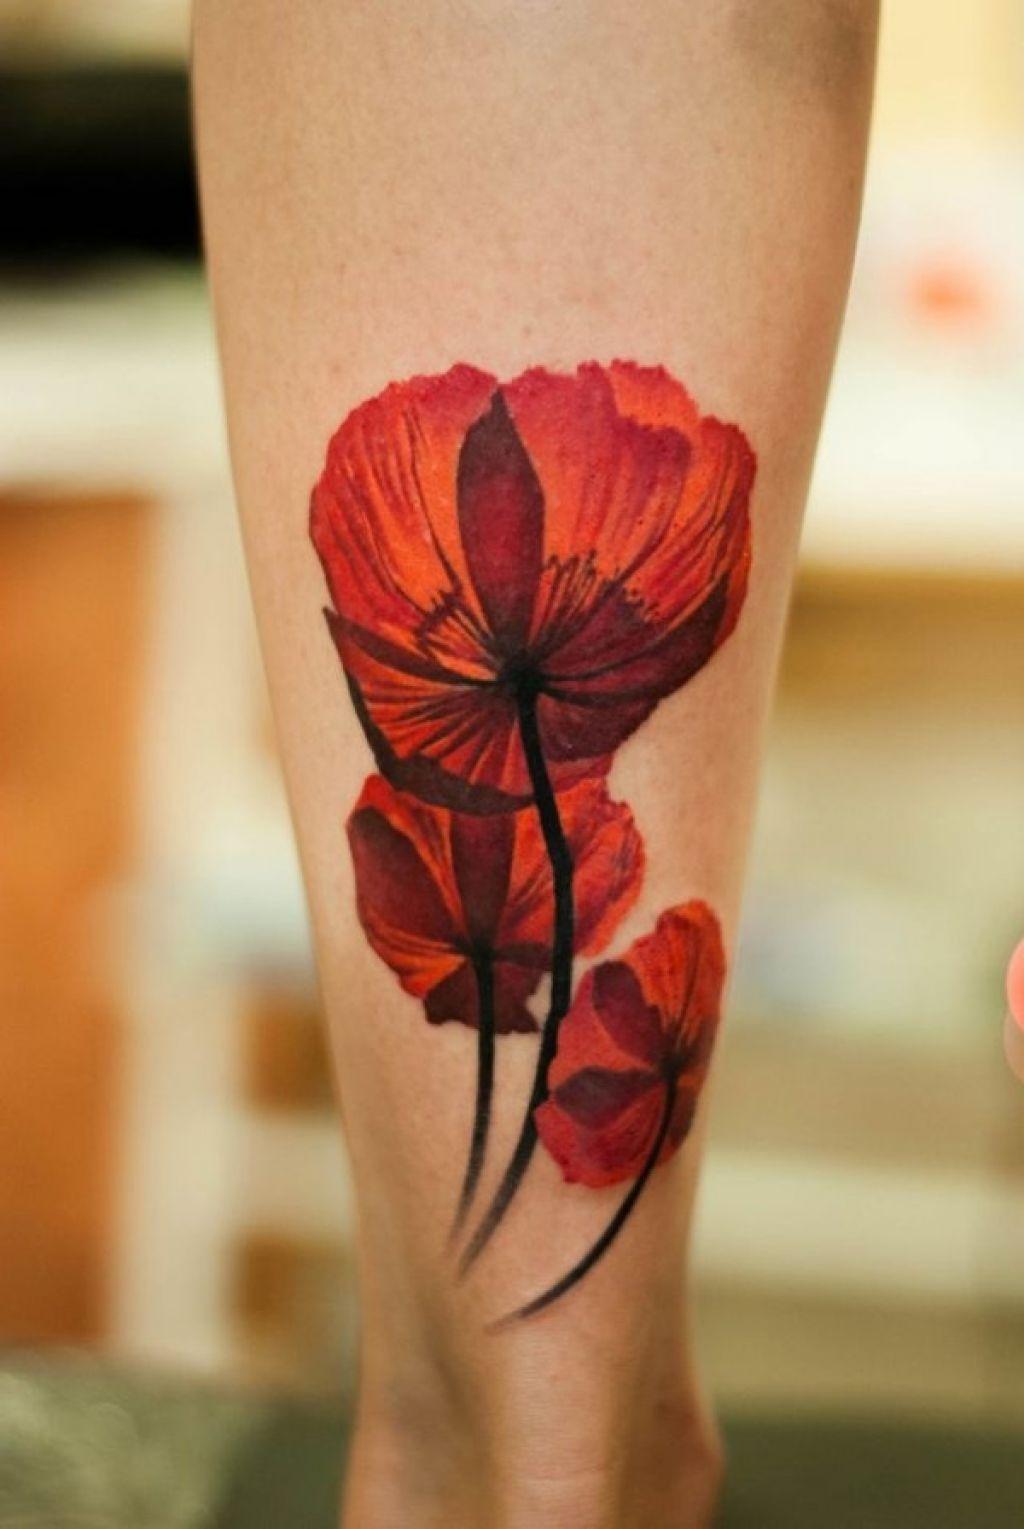 Poppy Flower Tattoo Best Tattoo Art Watercolor Tattoos For Foot